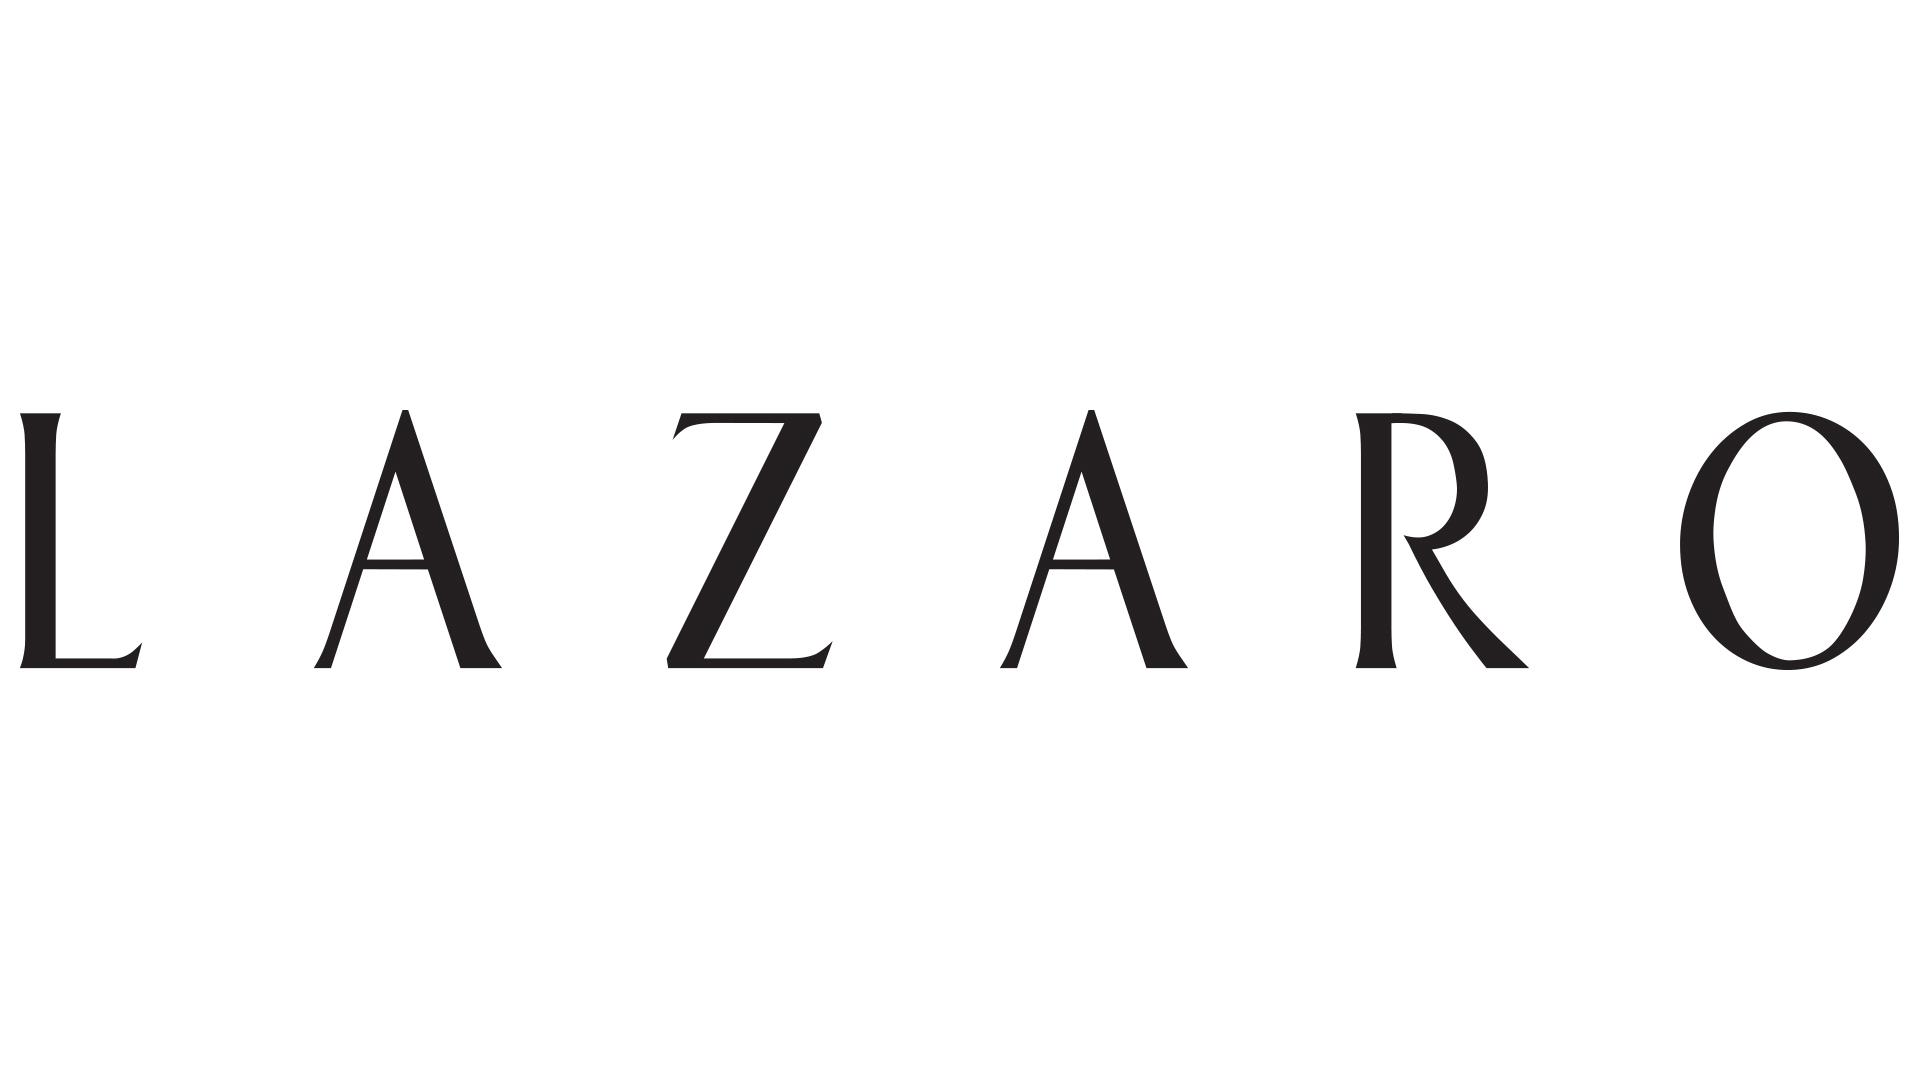 Lazaro_logo_1080.jpg